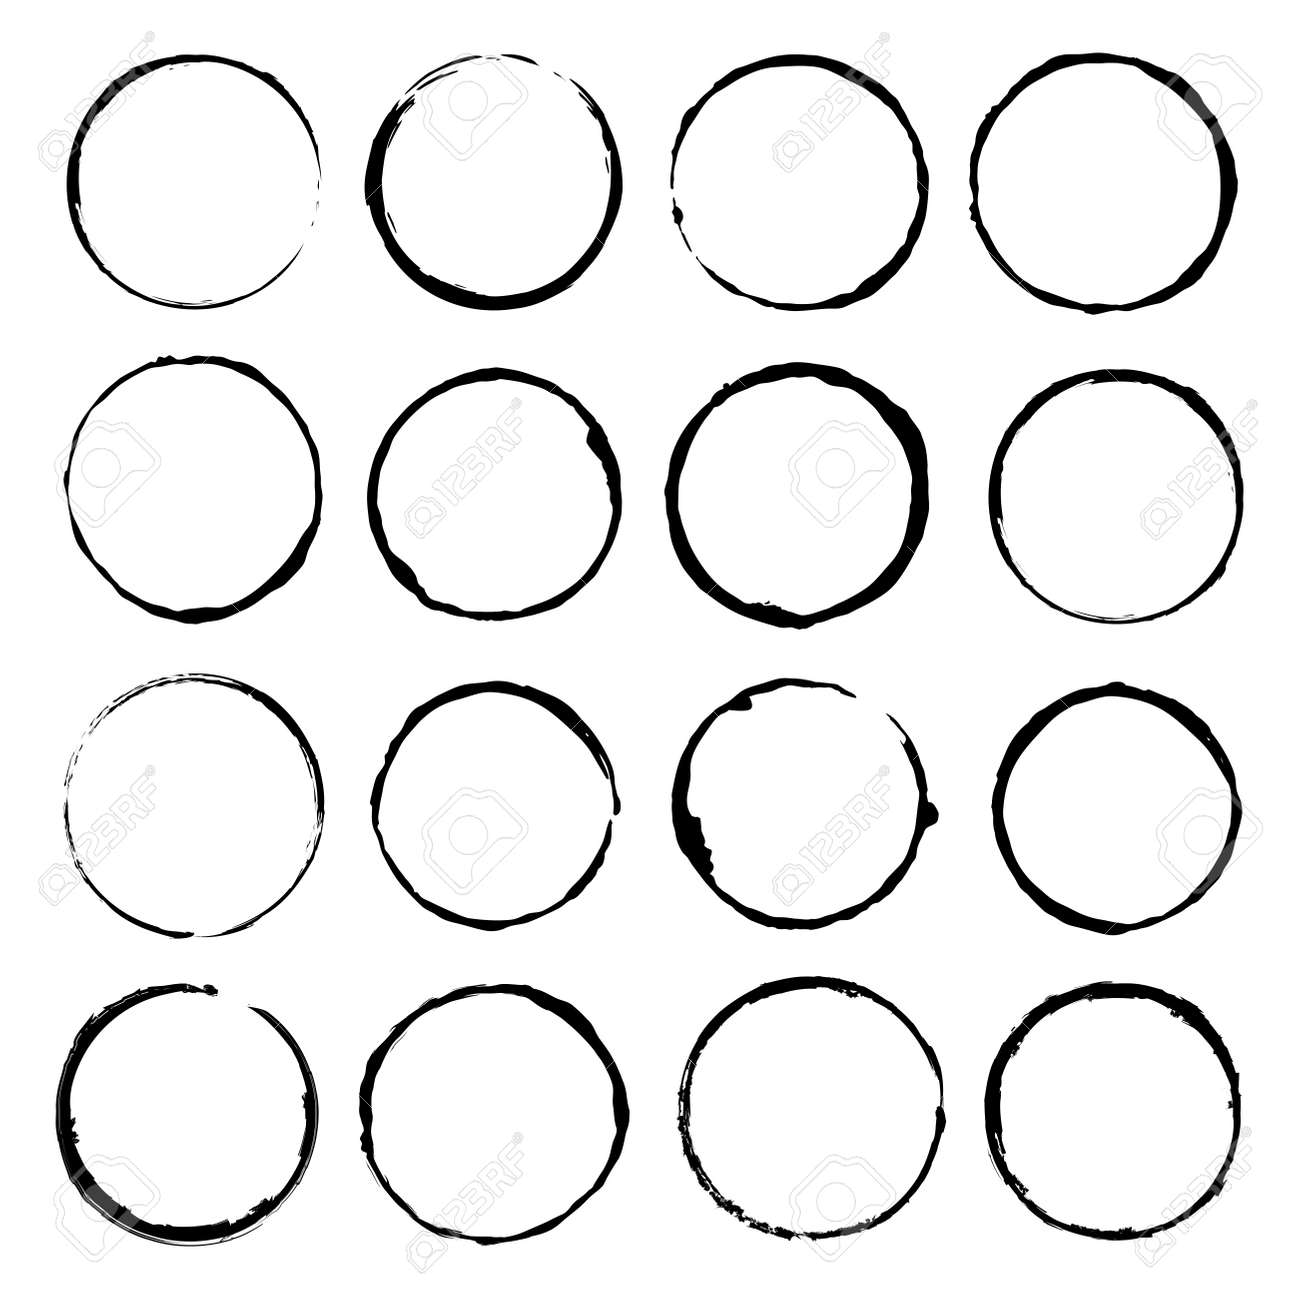 Vector set of grunge circle brush vector illustration - 131237736